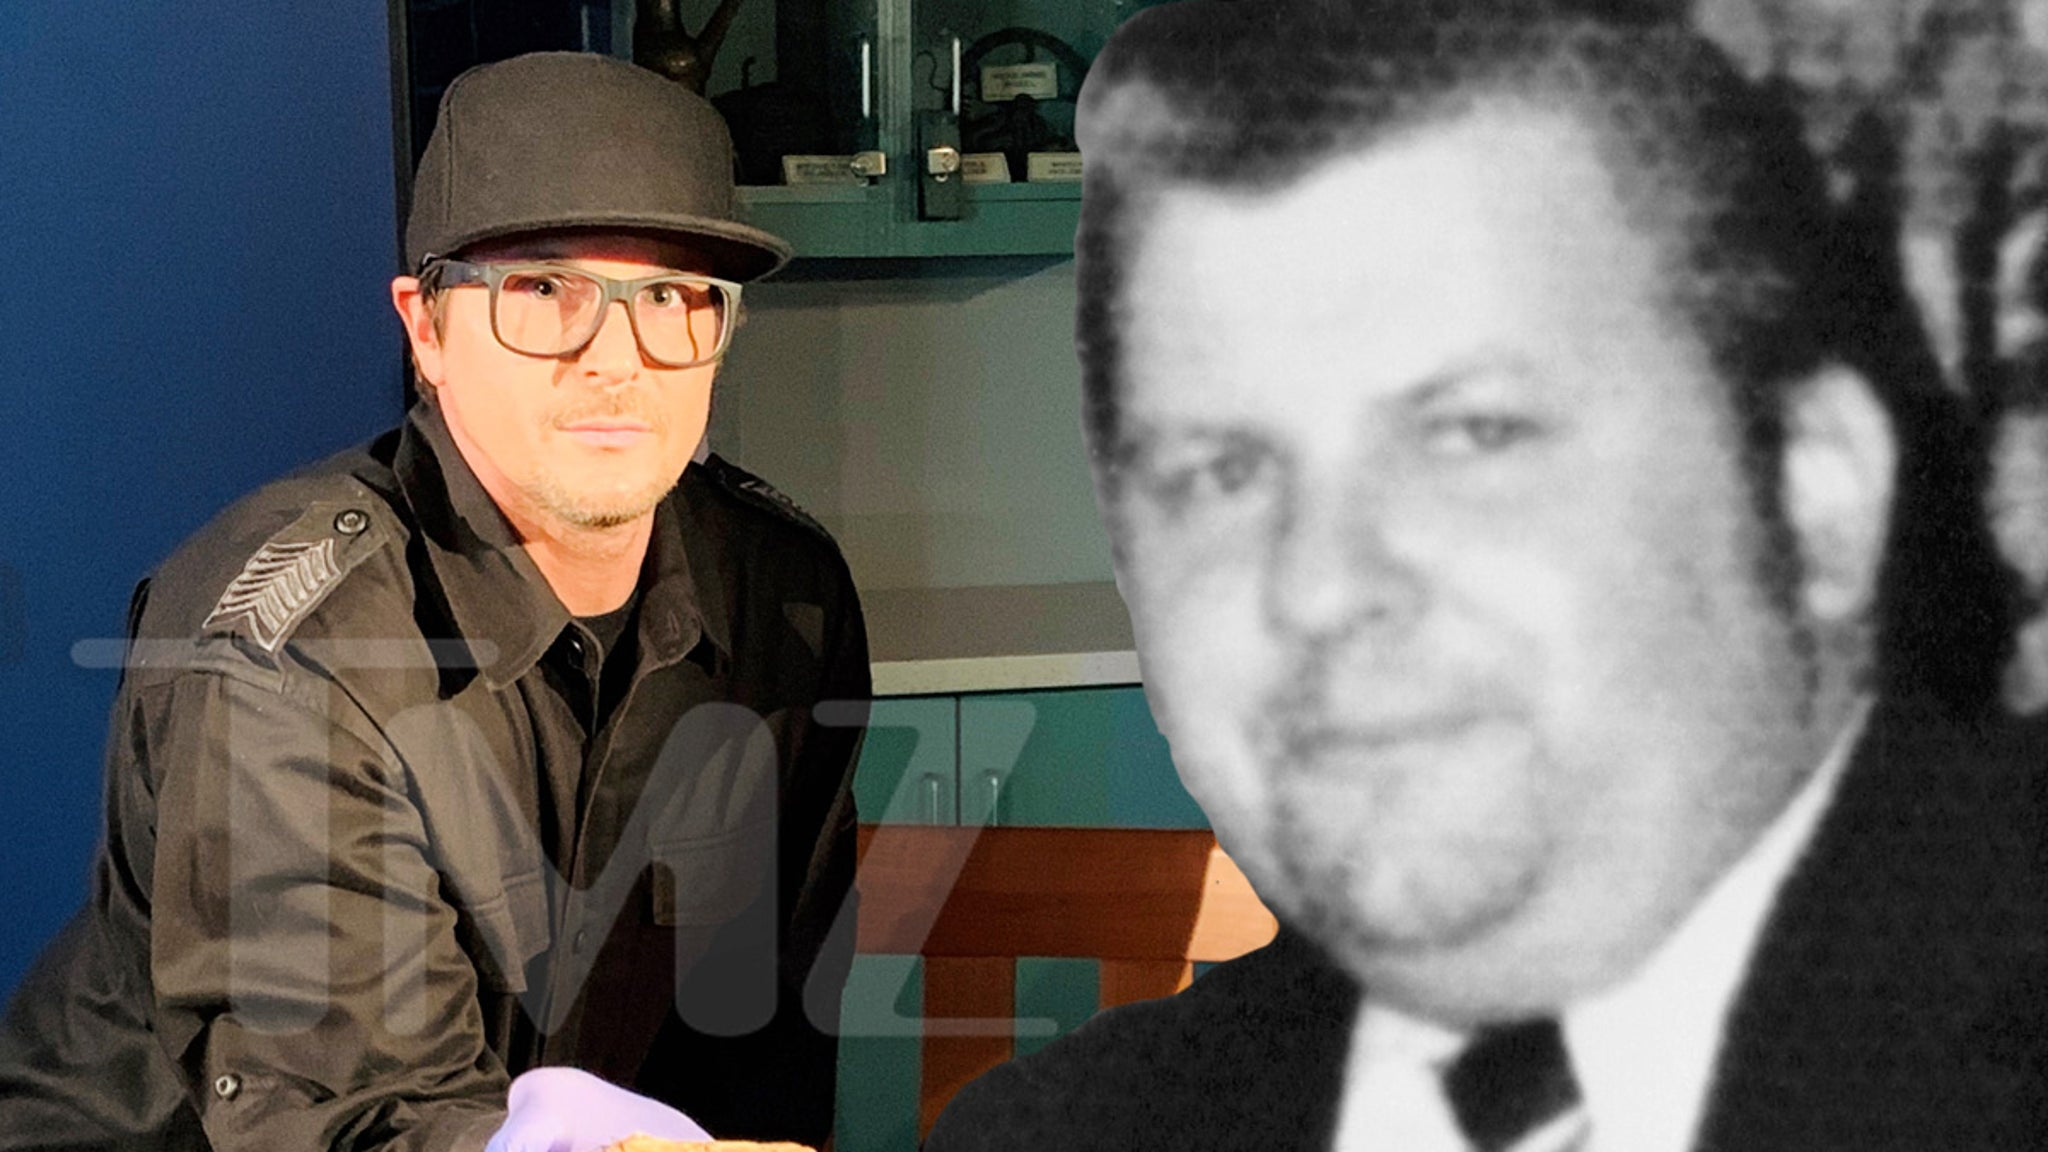 Zak Bagans Wants to Buy Serial Killer John Wayne Gacy's Brain